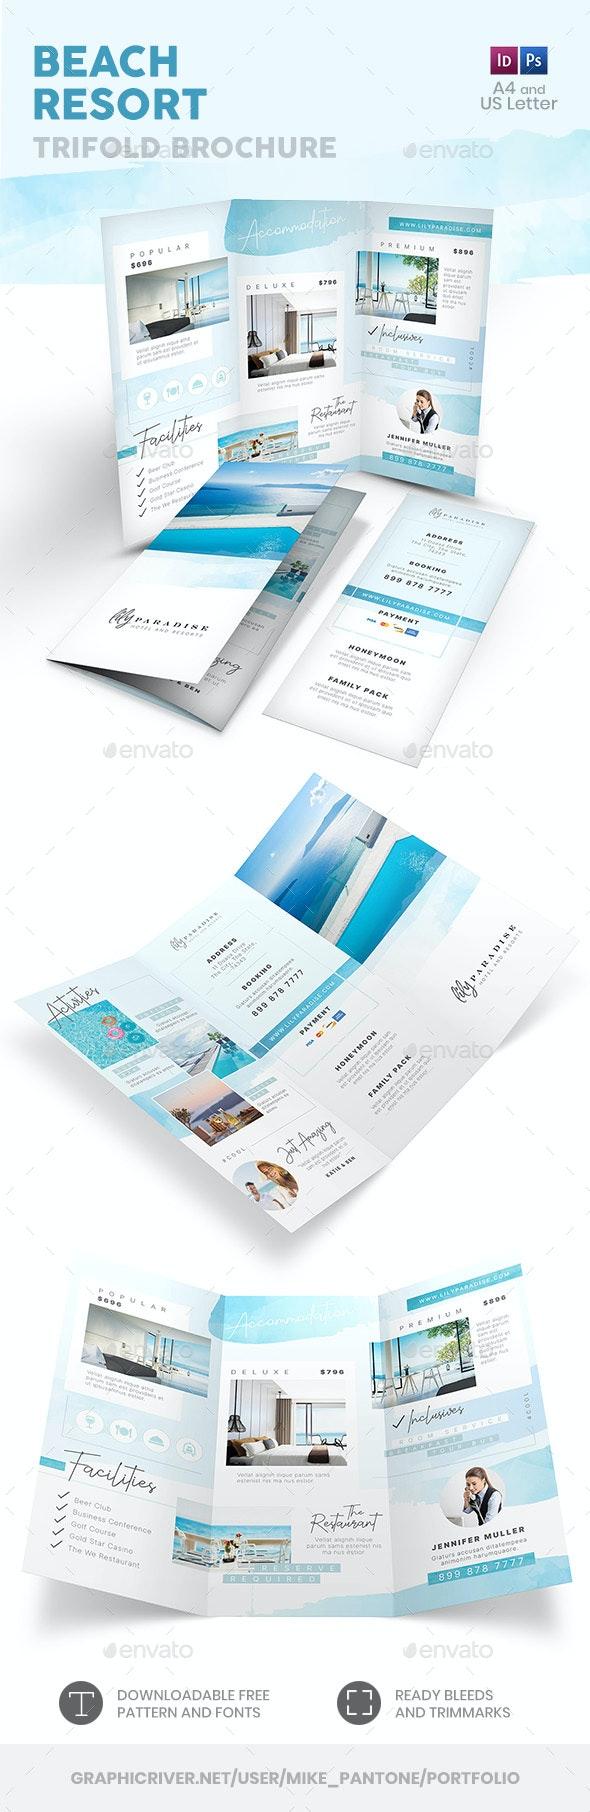 Beach Resort Trifold Brochure 3 - Informational Brochures